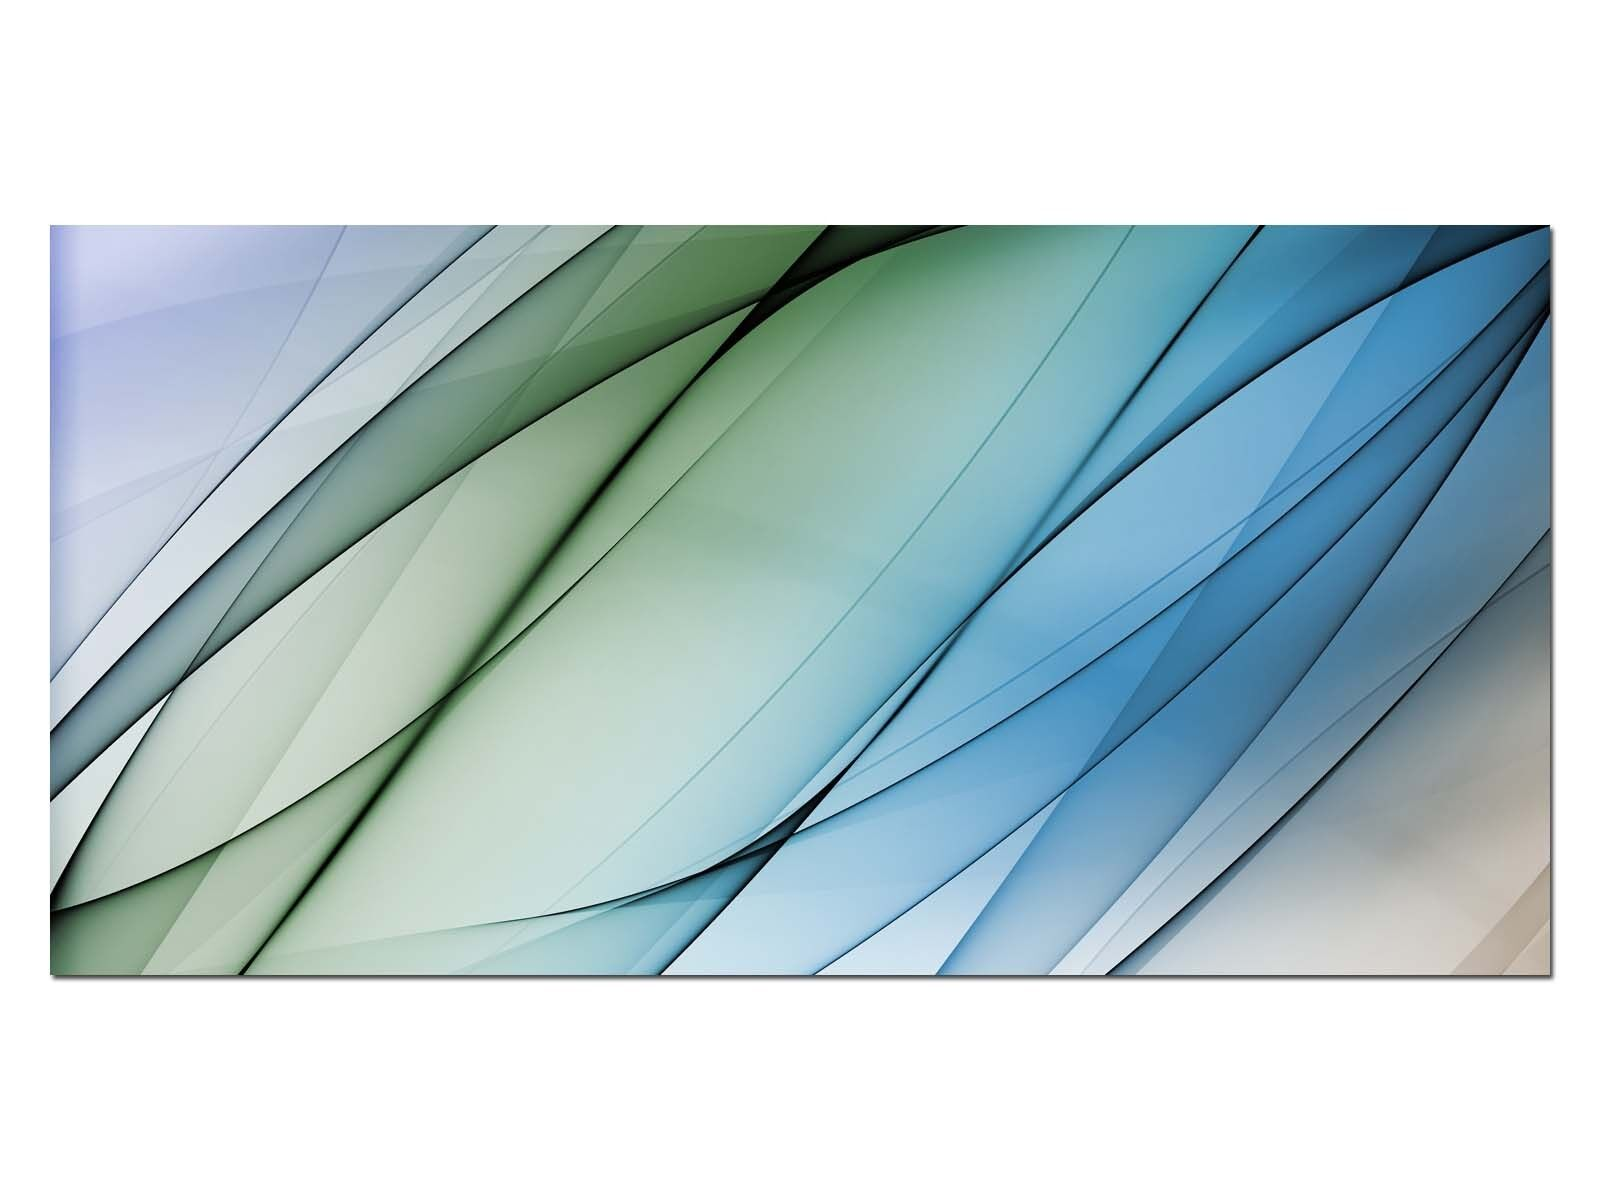 Deco Glass Picture EG4100500764 STRIPES DESIGN Blau Größe 39,37  x 19,68  HD Prin